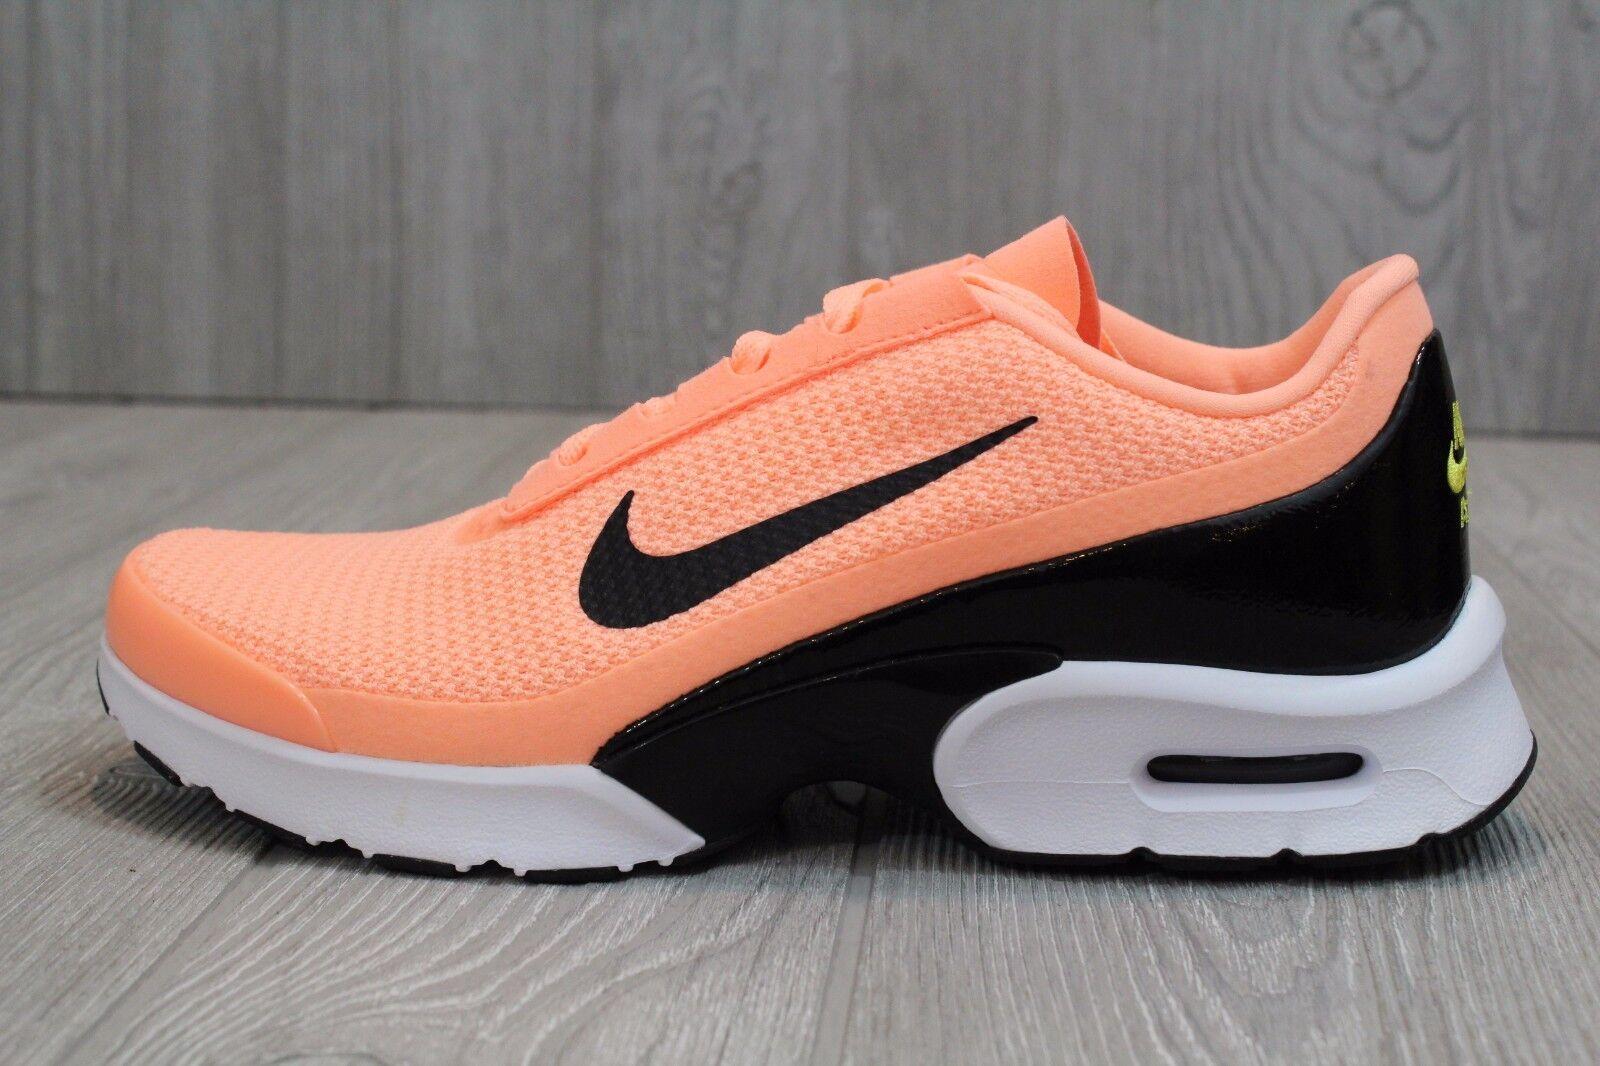 22 nuovi raro nike air max le scarpe da corsa sunset glow dimensioni 7 jewell